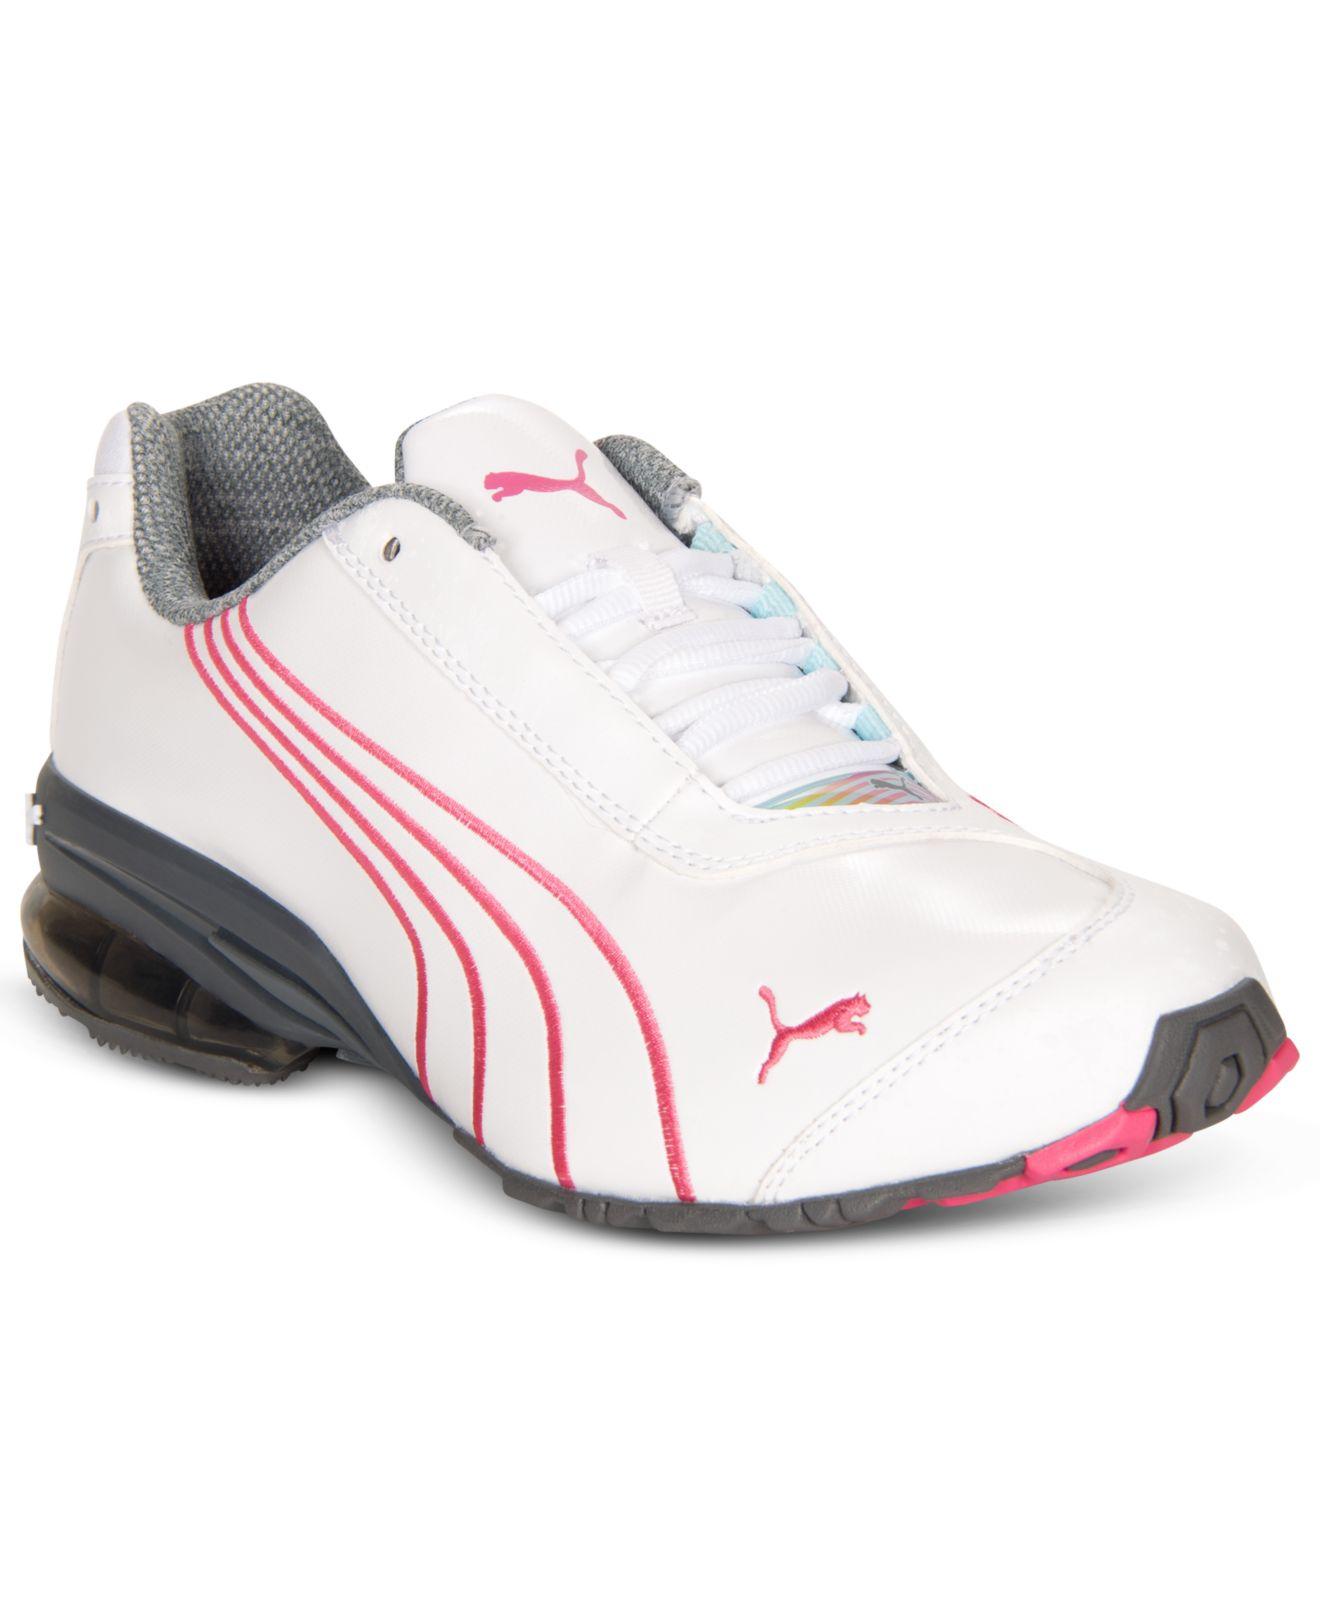 puma women's jago 8 sneakers